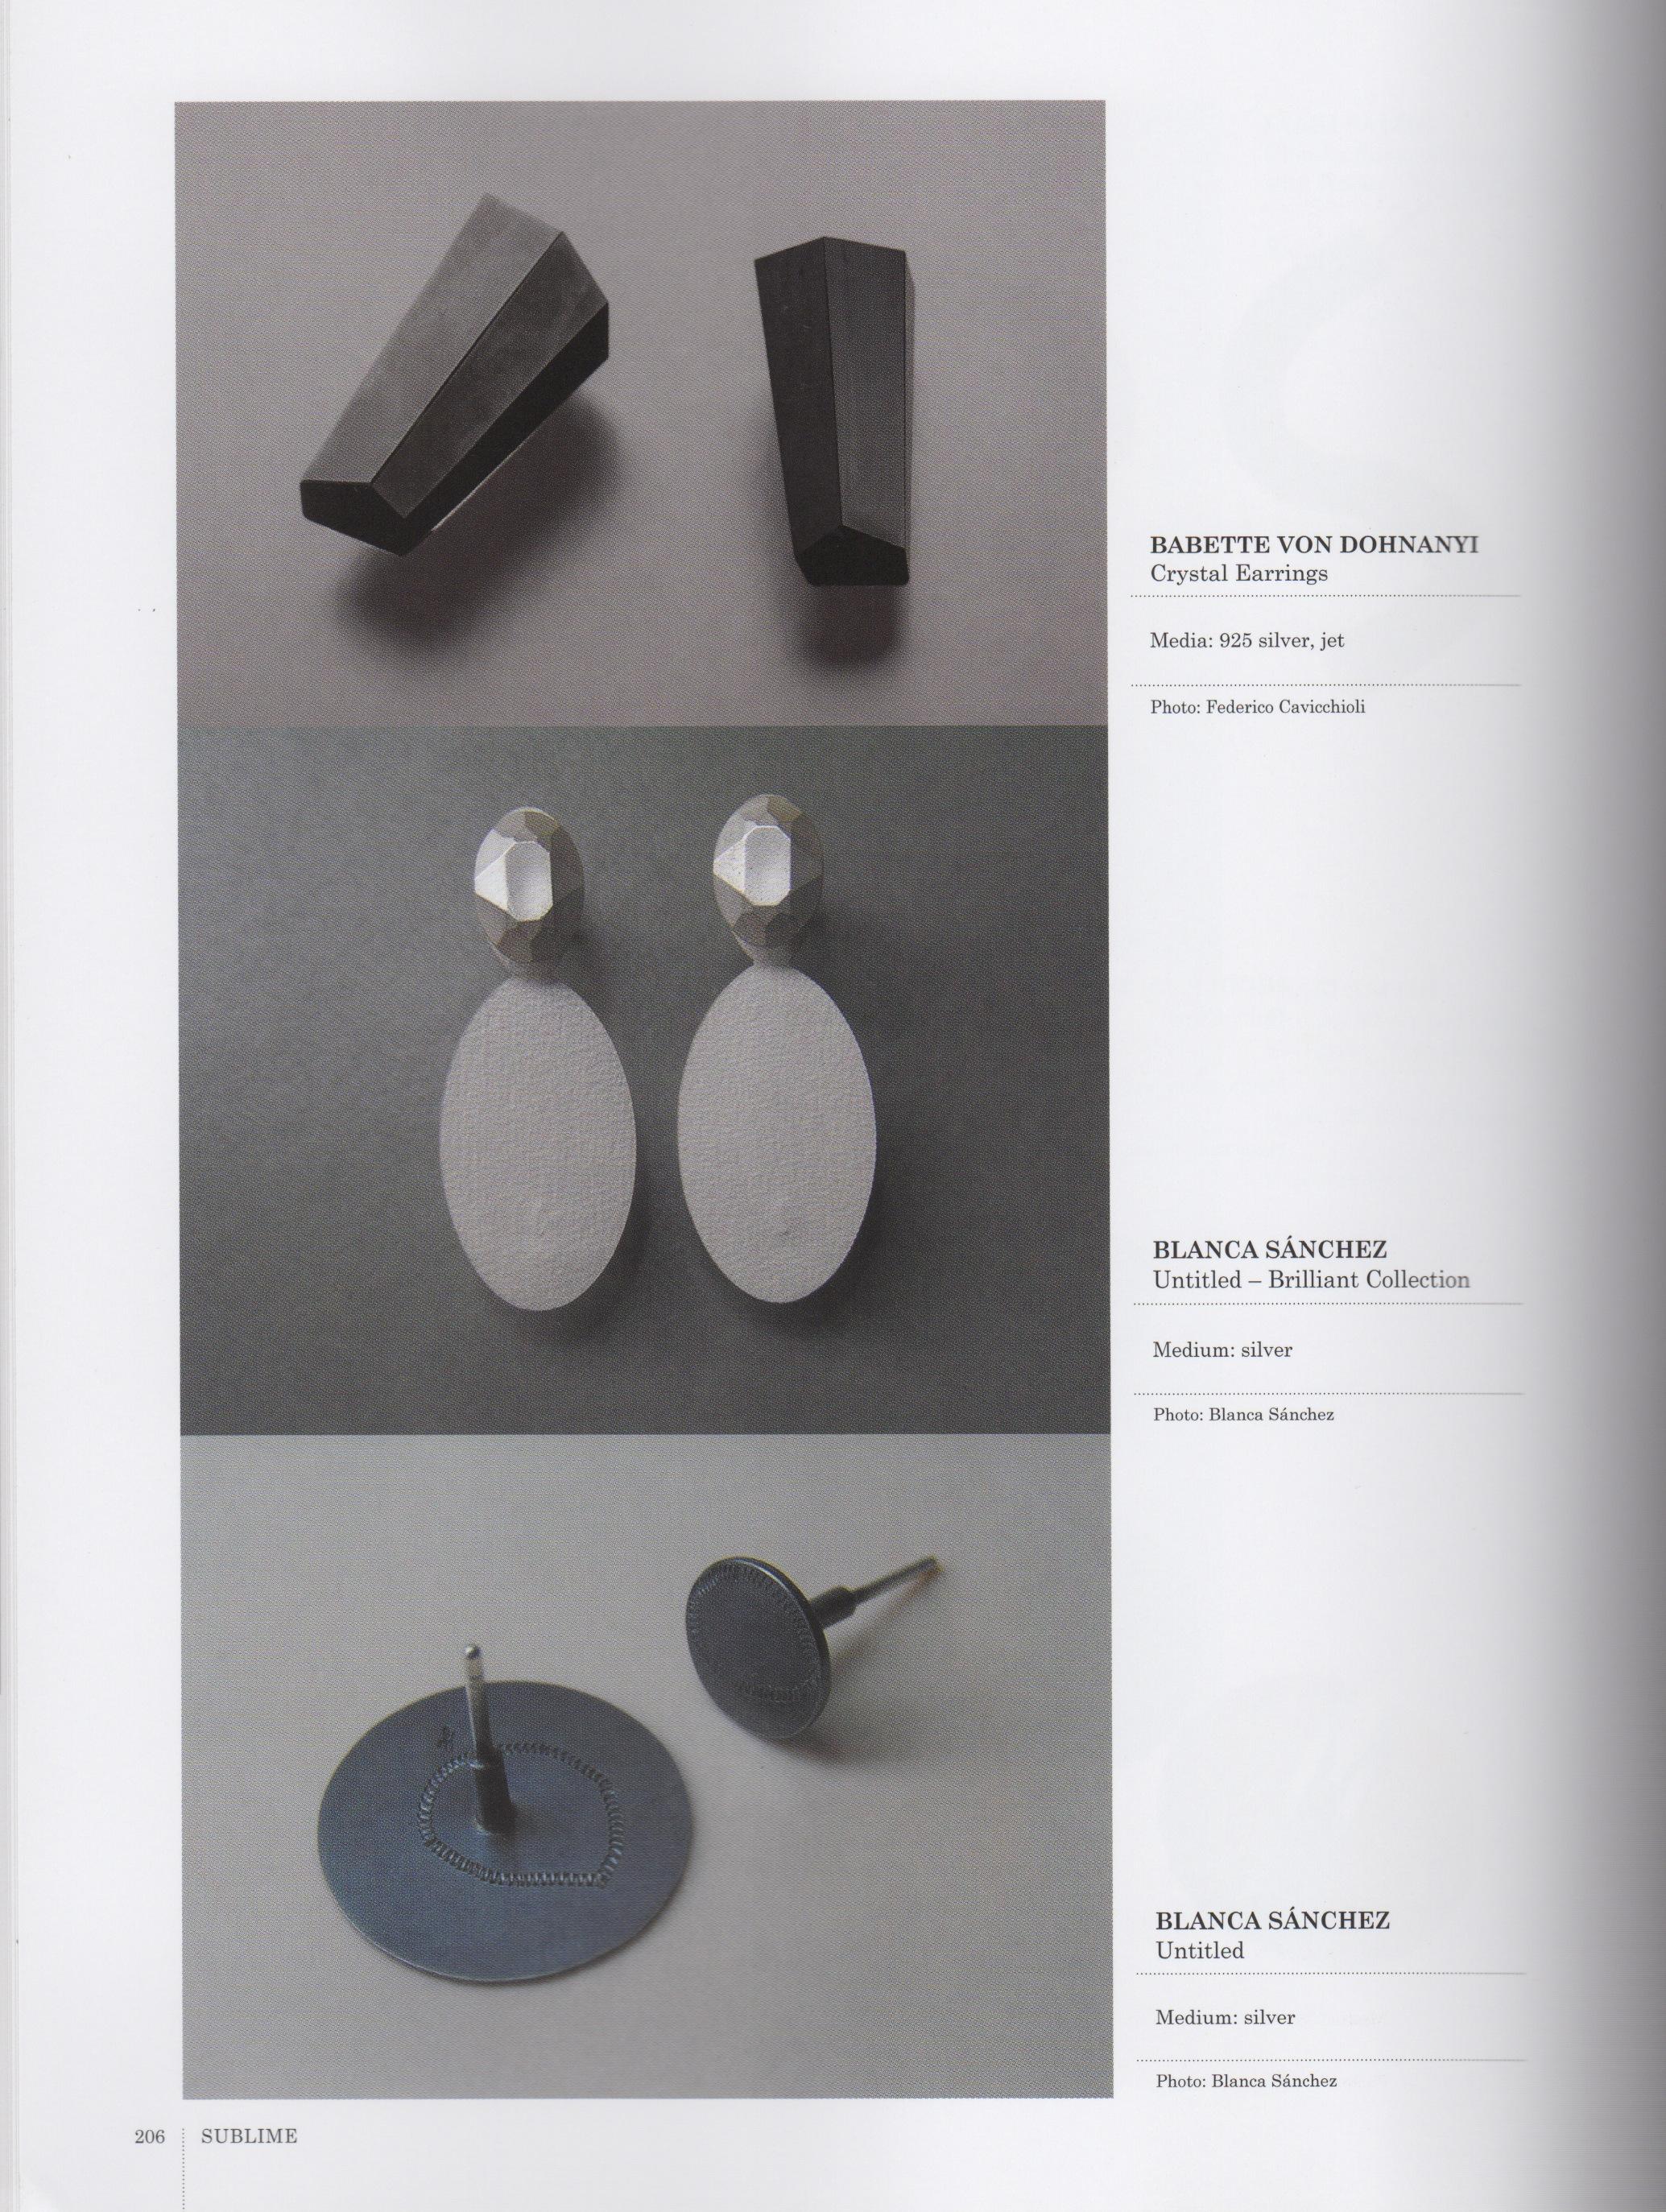 EARRINGS BOOK 3